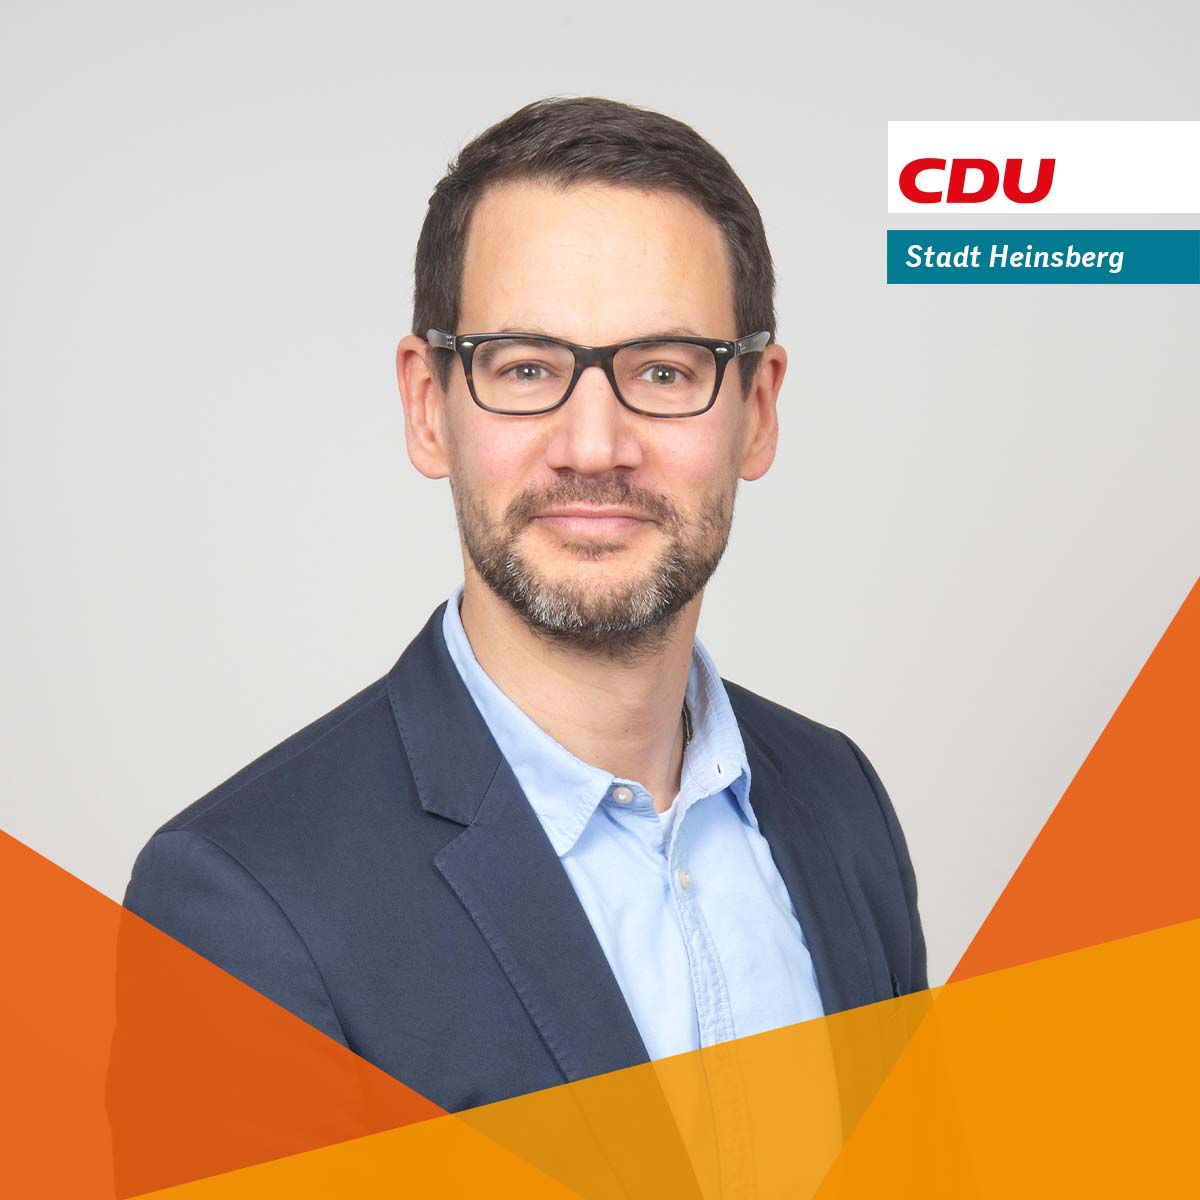 CDU Stadtverband Heinsberg - Philipp Jansen - Heinsberg